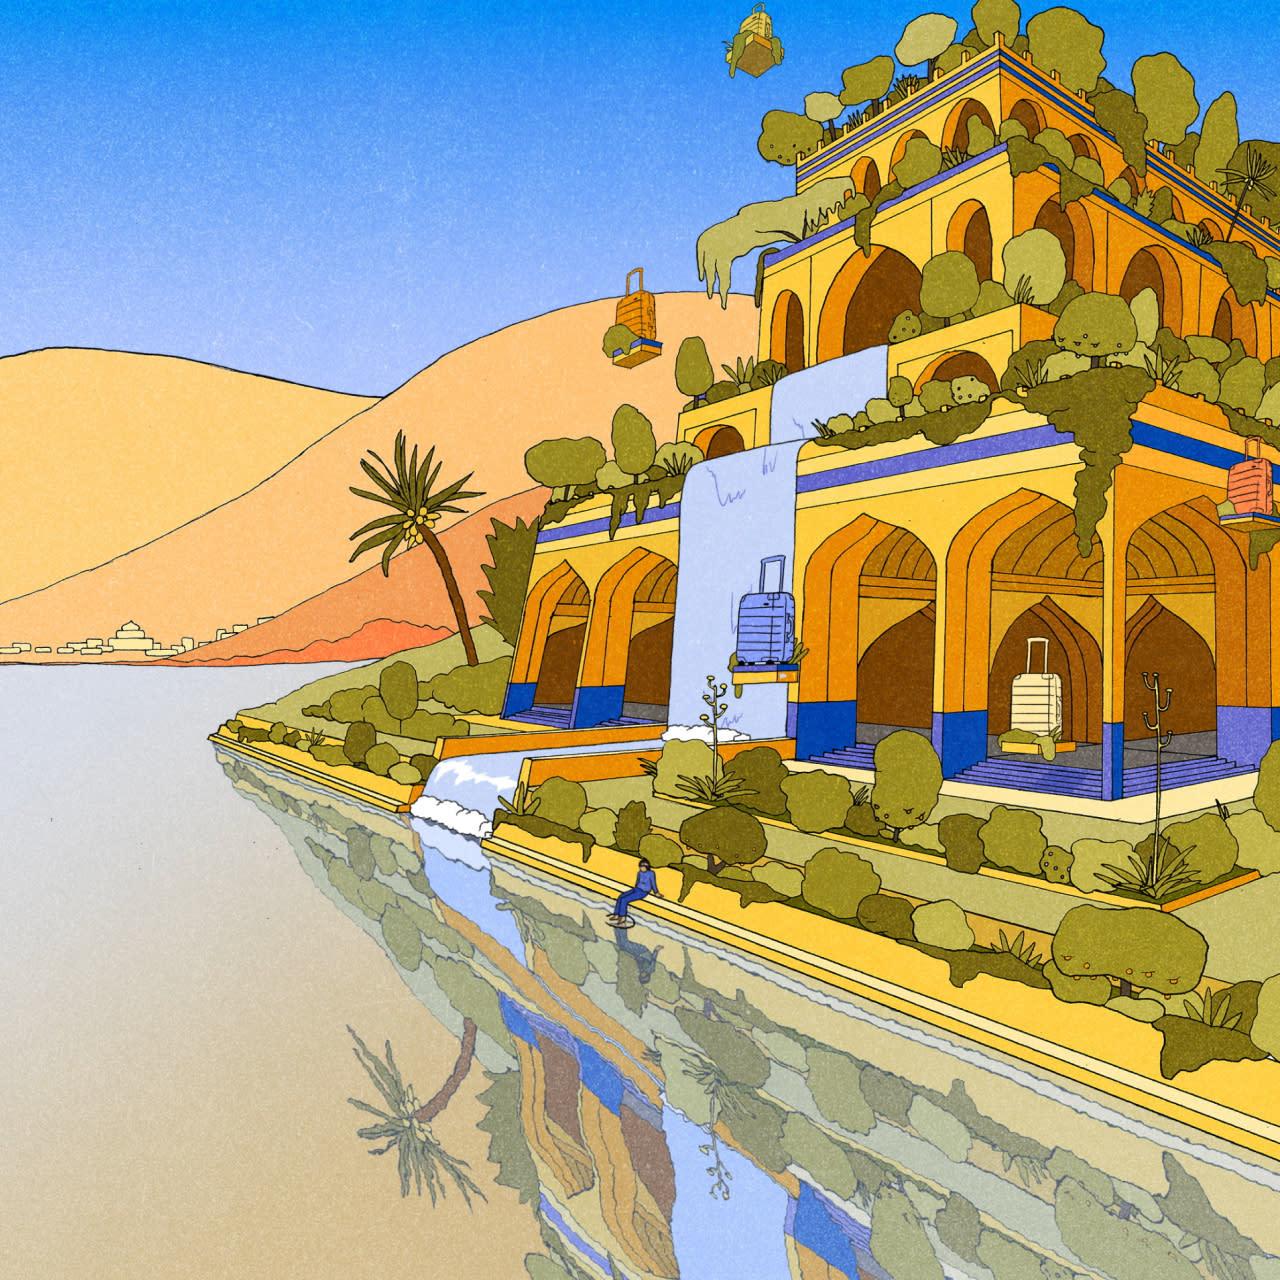 Illustrated Hanging Gardens of Babylon